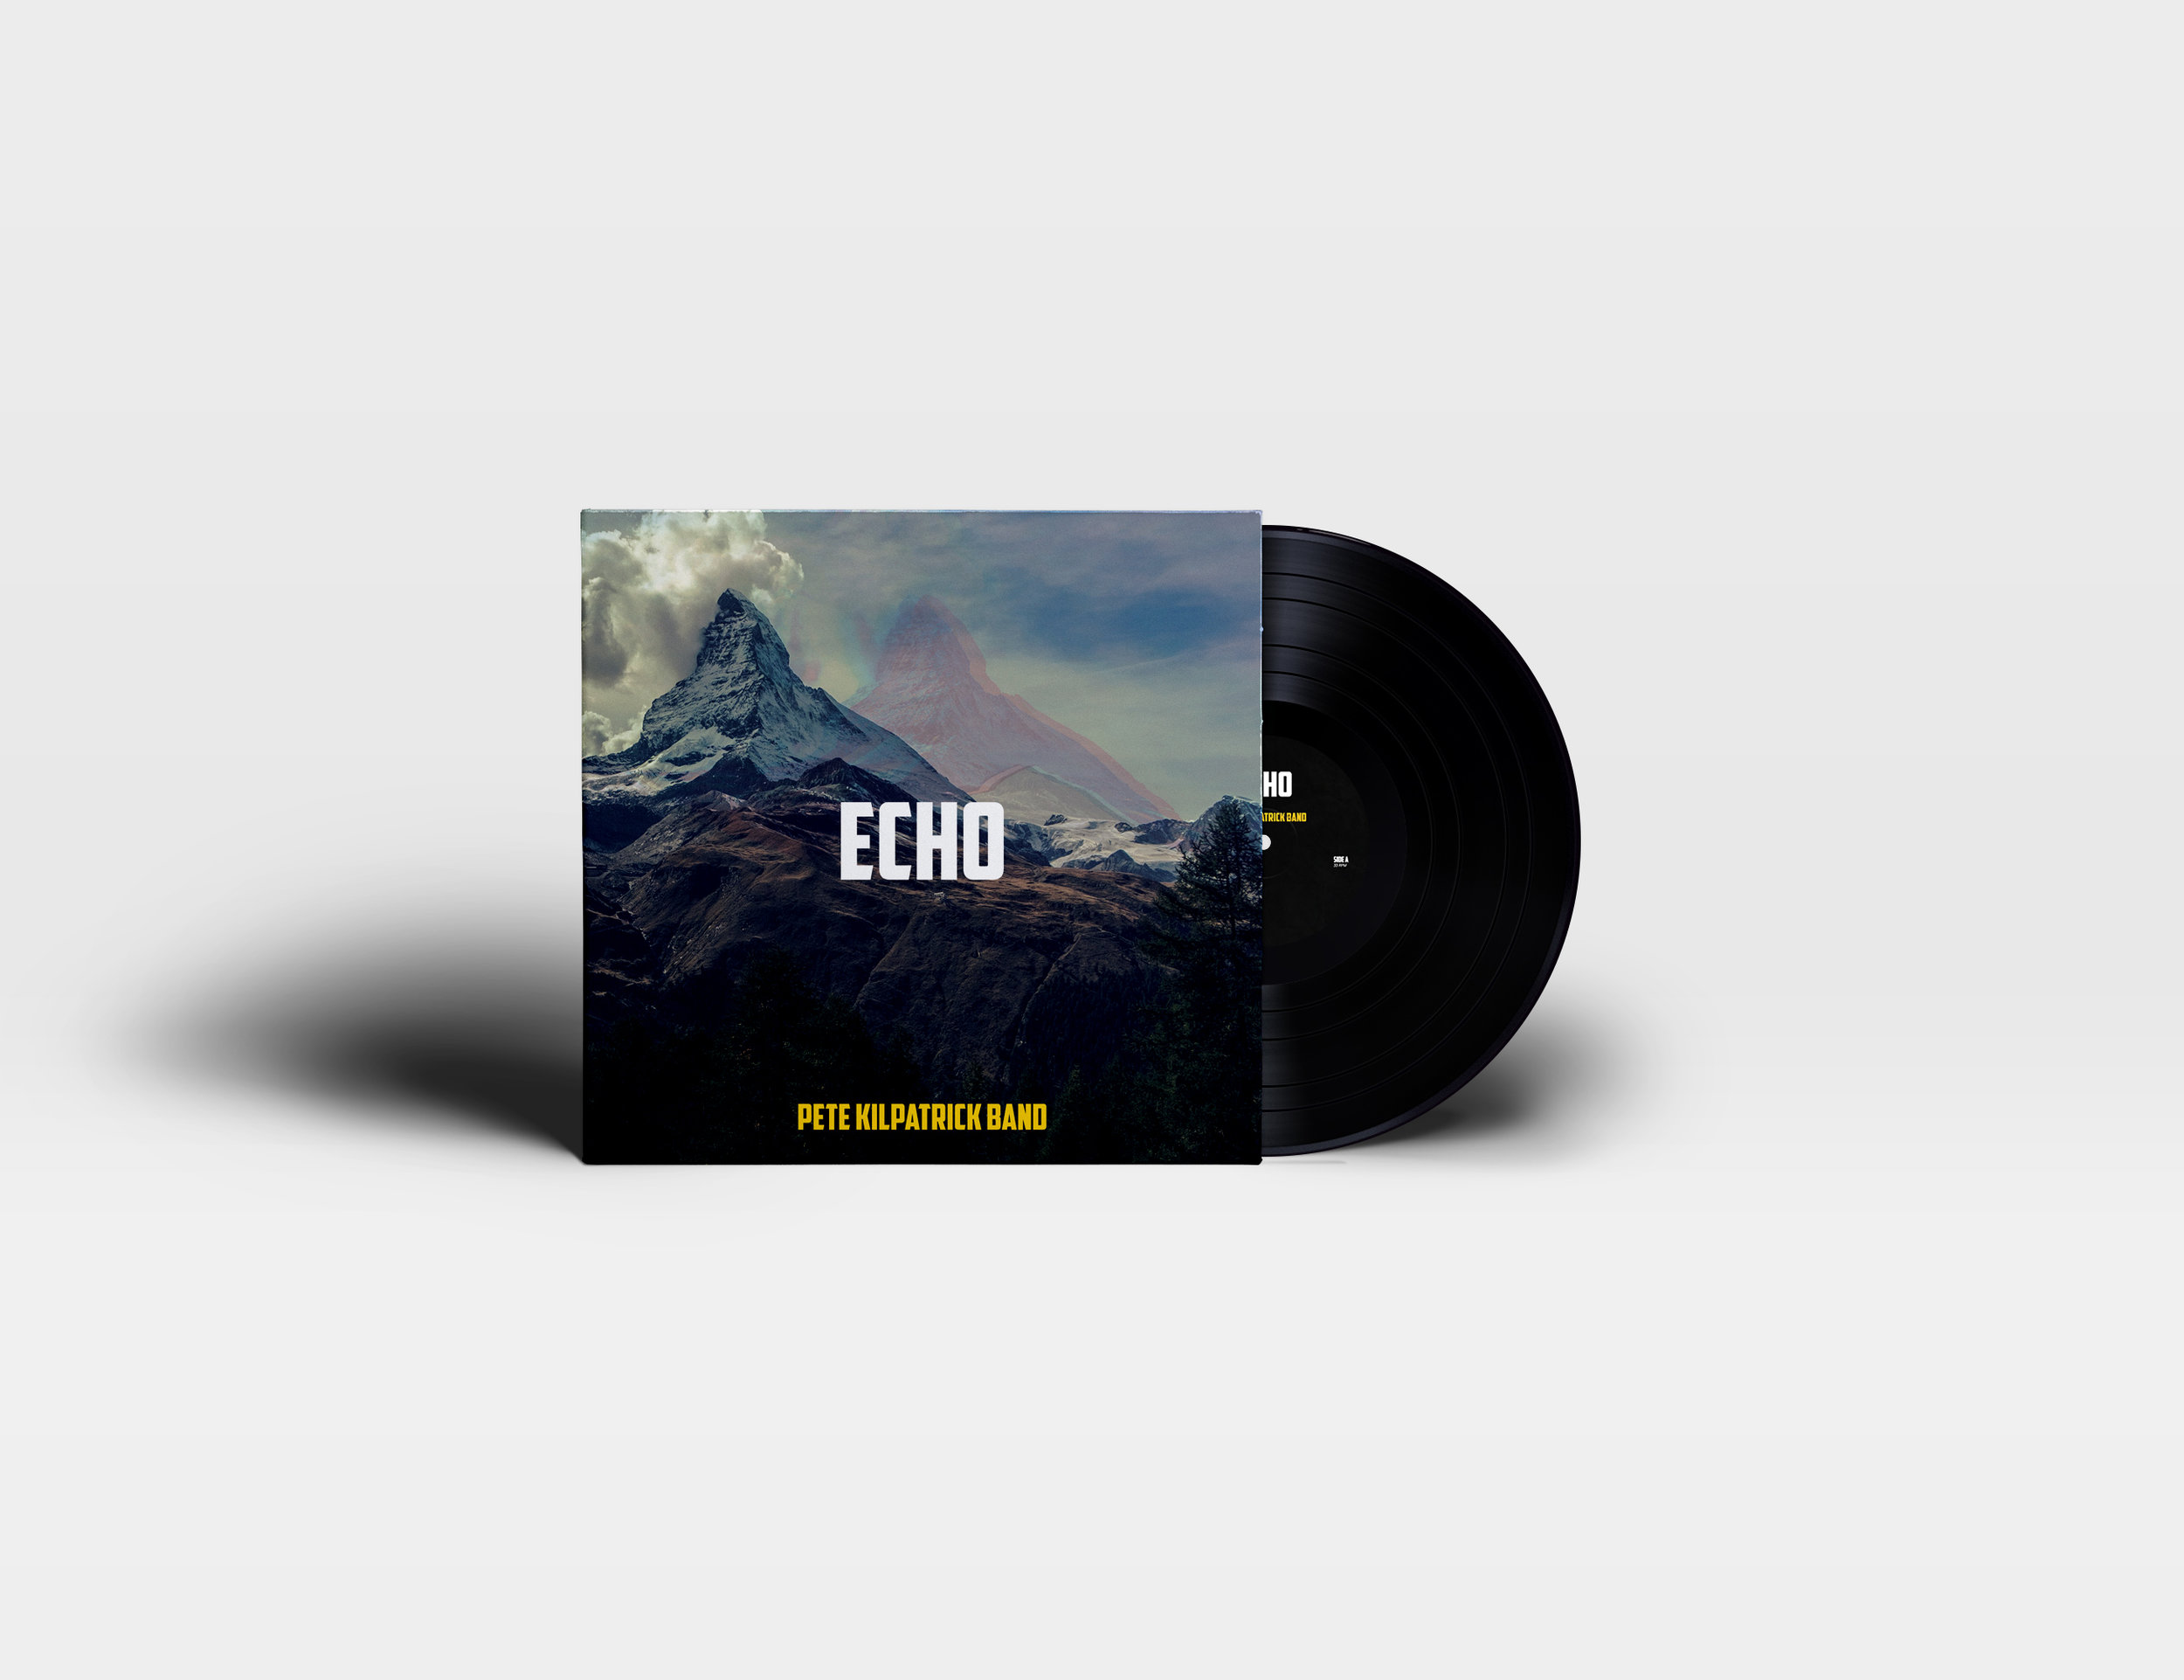 Album Artwork and Layout Design Services